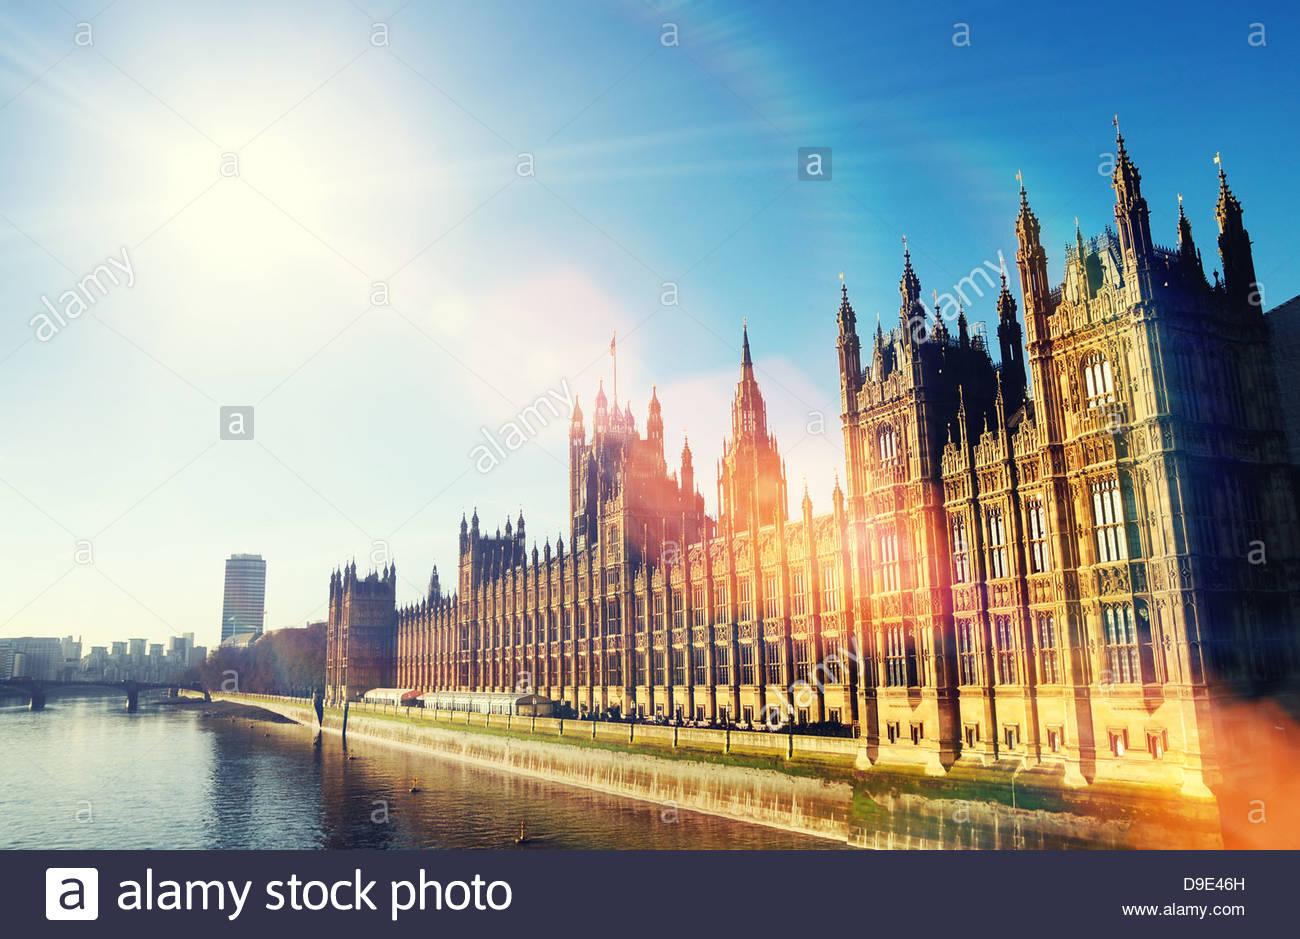 Sonnenschein Parlament Stockbild